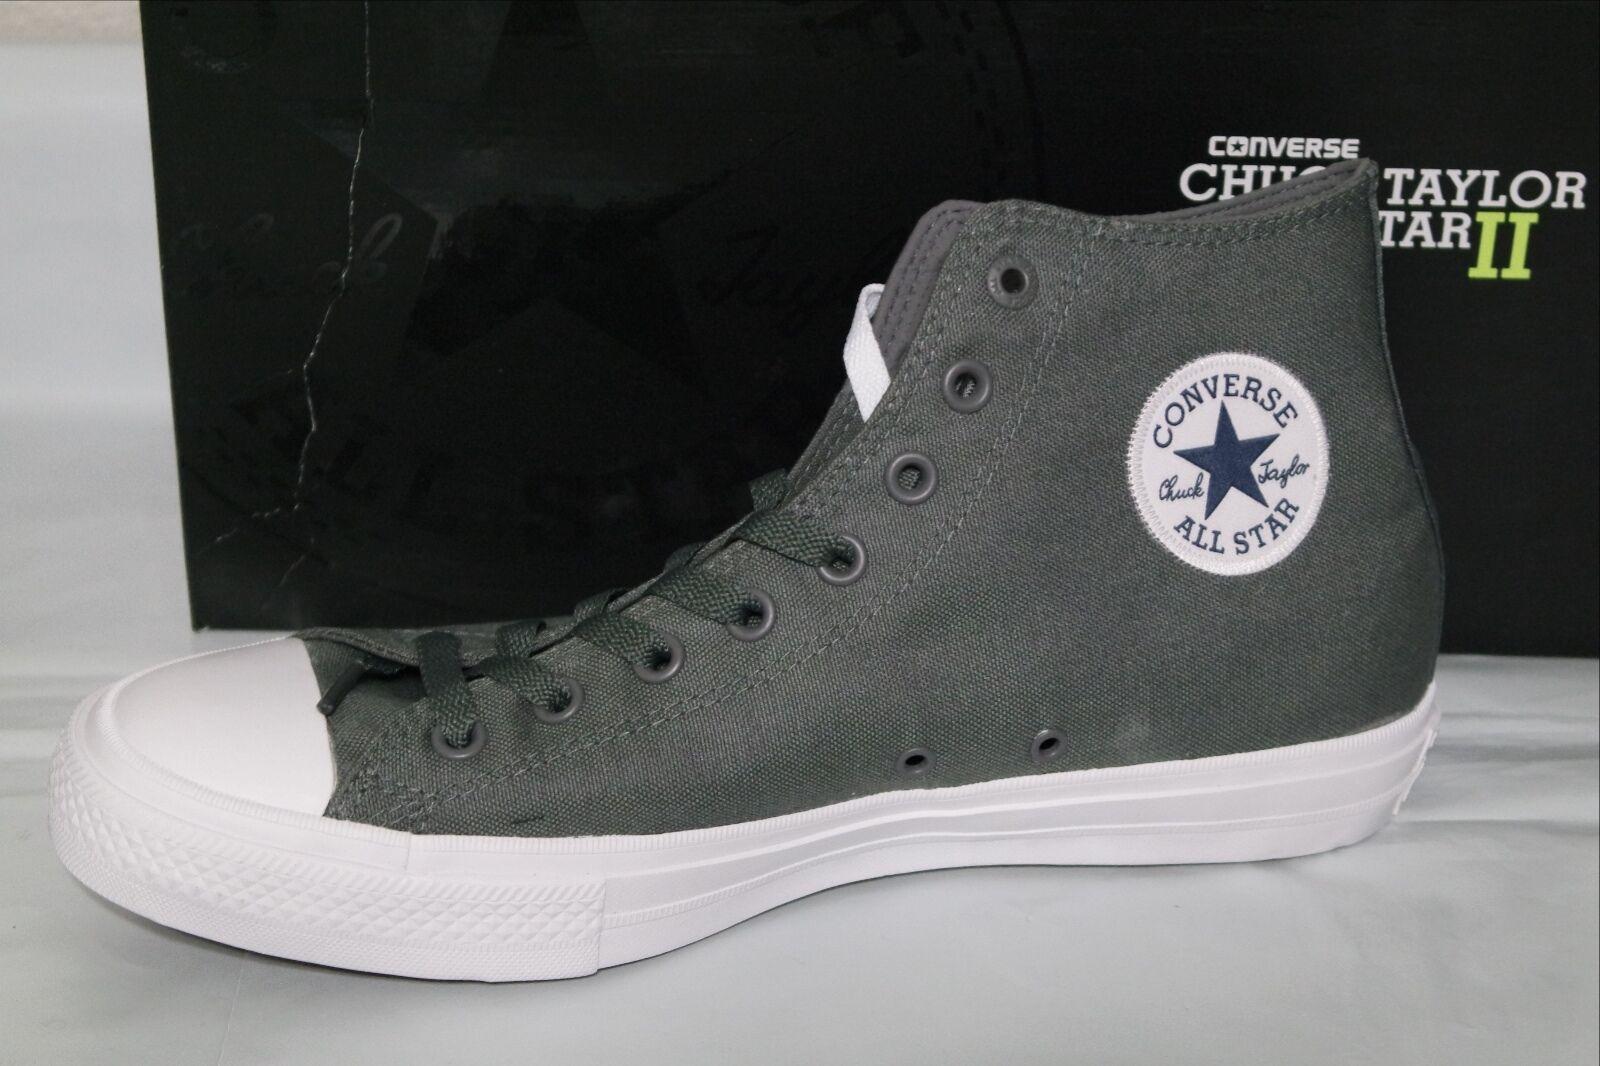 e7139b92c018 Converse Chuck Taylor All Star II 2 Thunder Grey White Men Casual ...